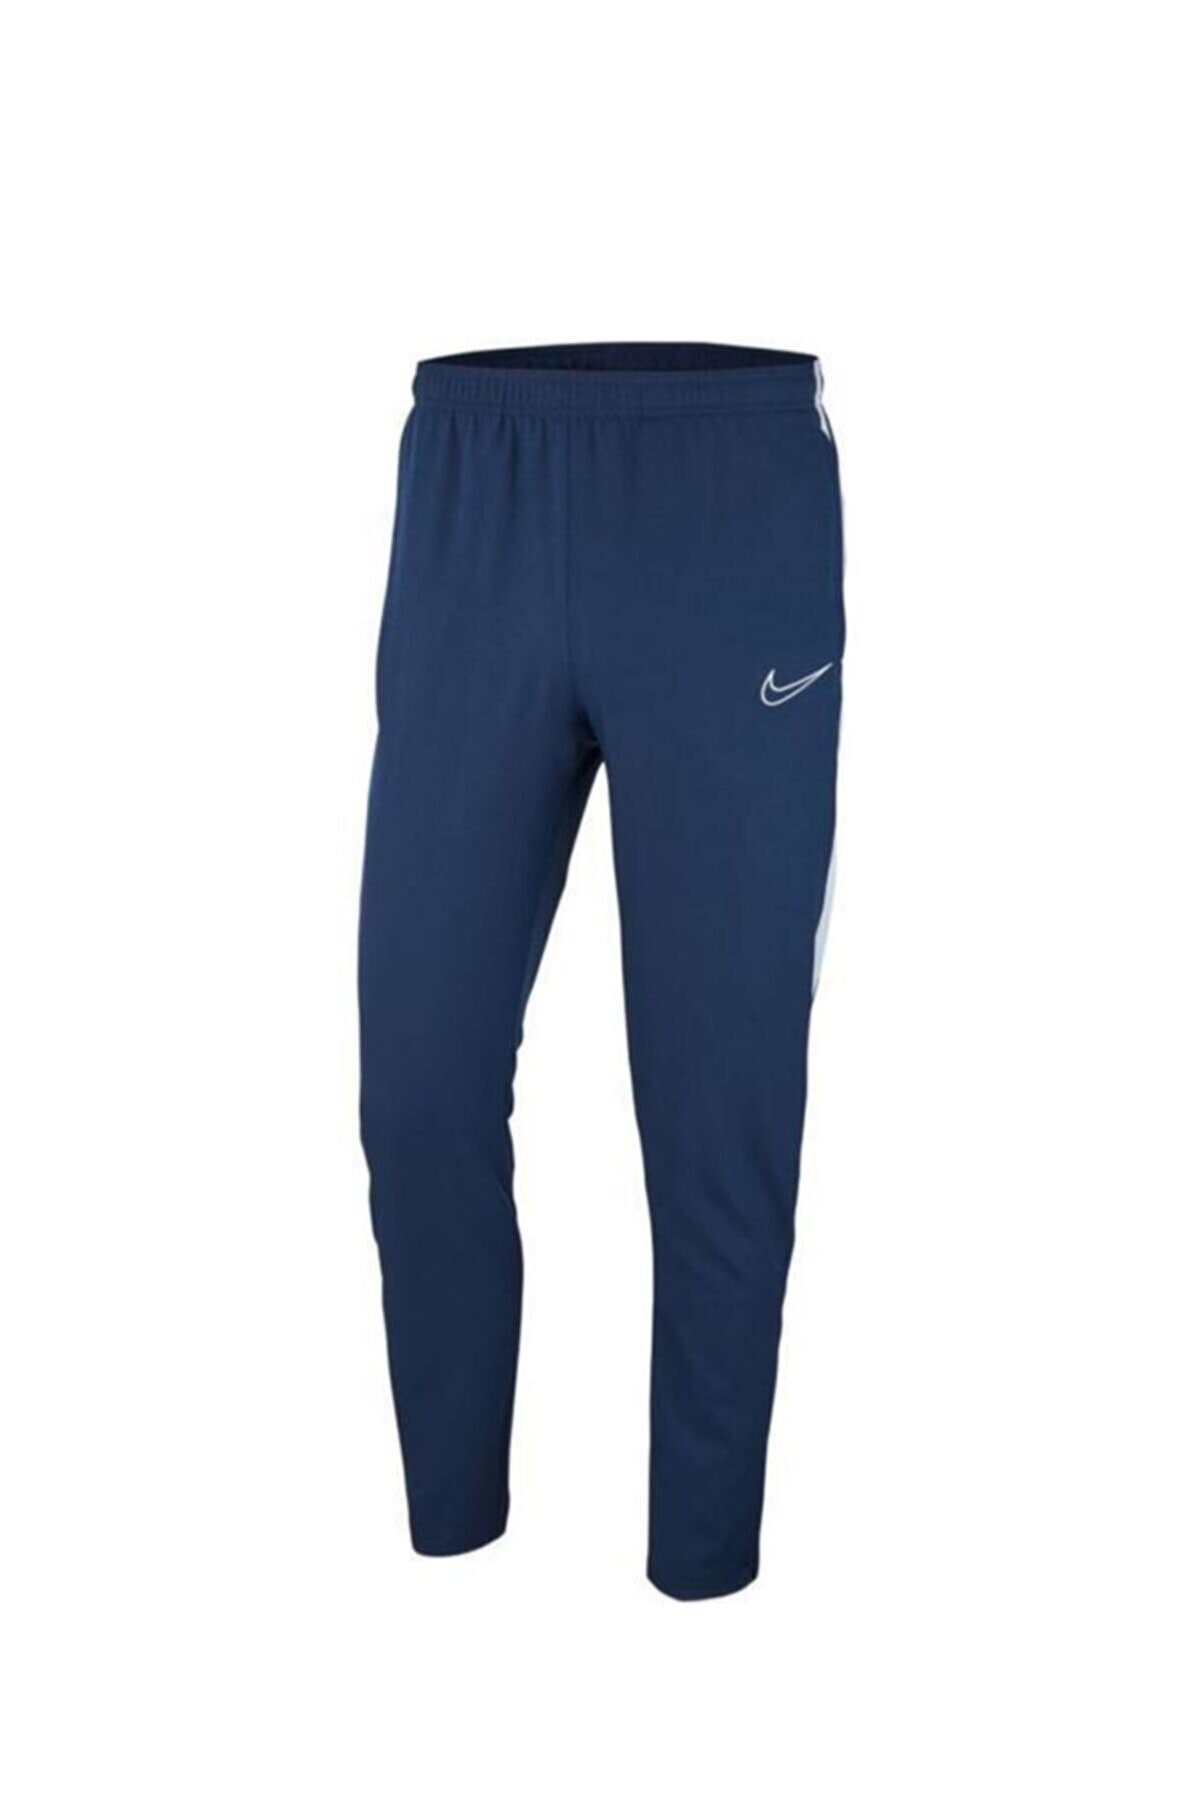 Nike Acedemy 19 Woven Pant Bv5836-451 Erkek Eşofman Altı